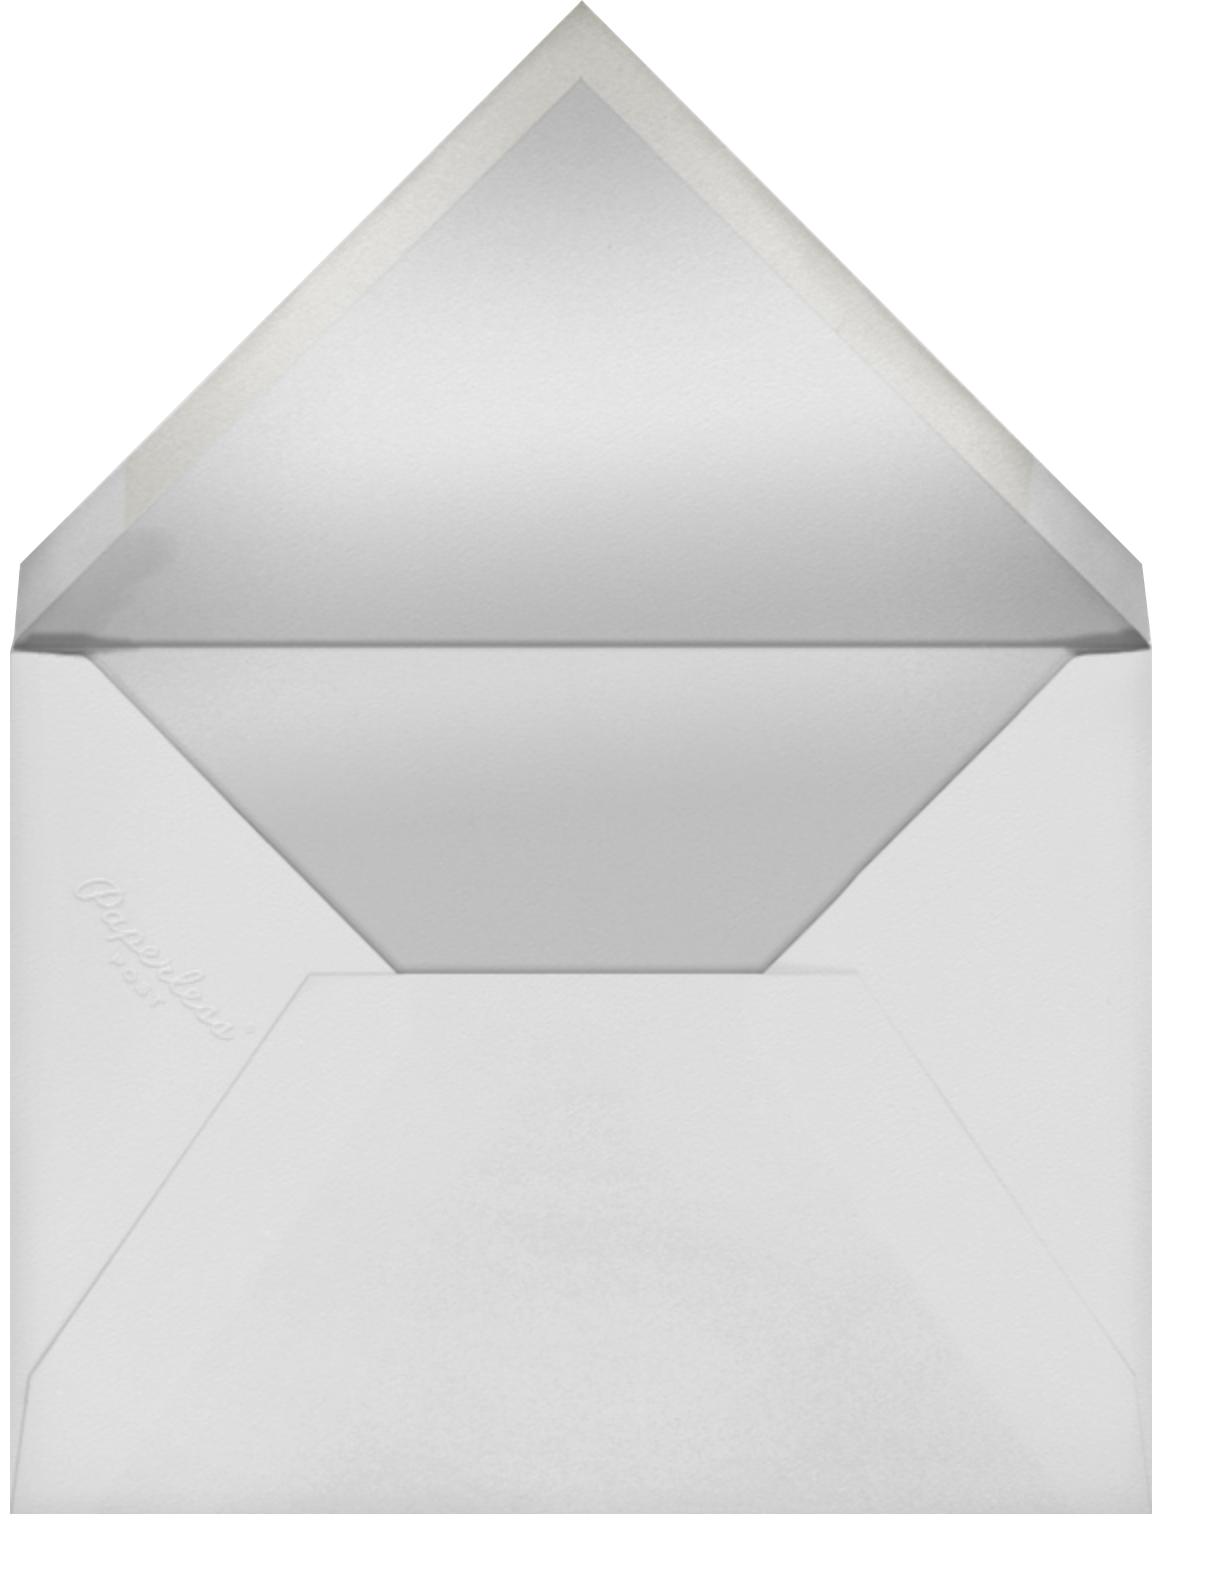 Dahlias (Menu) - Blue - Paperless Post - Menus - envelope back